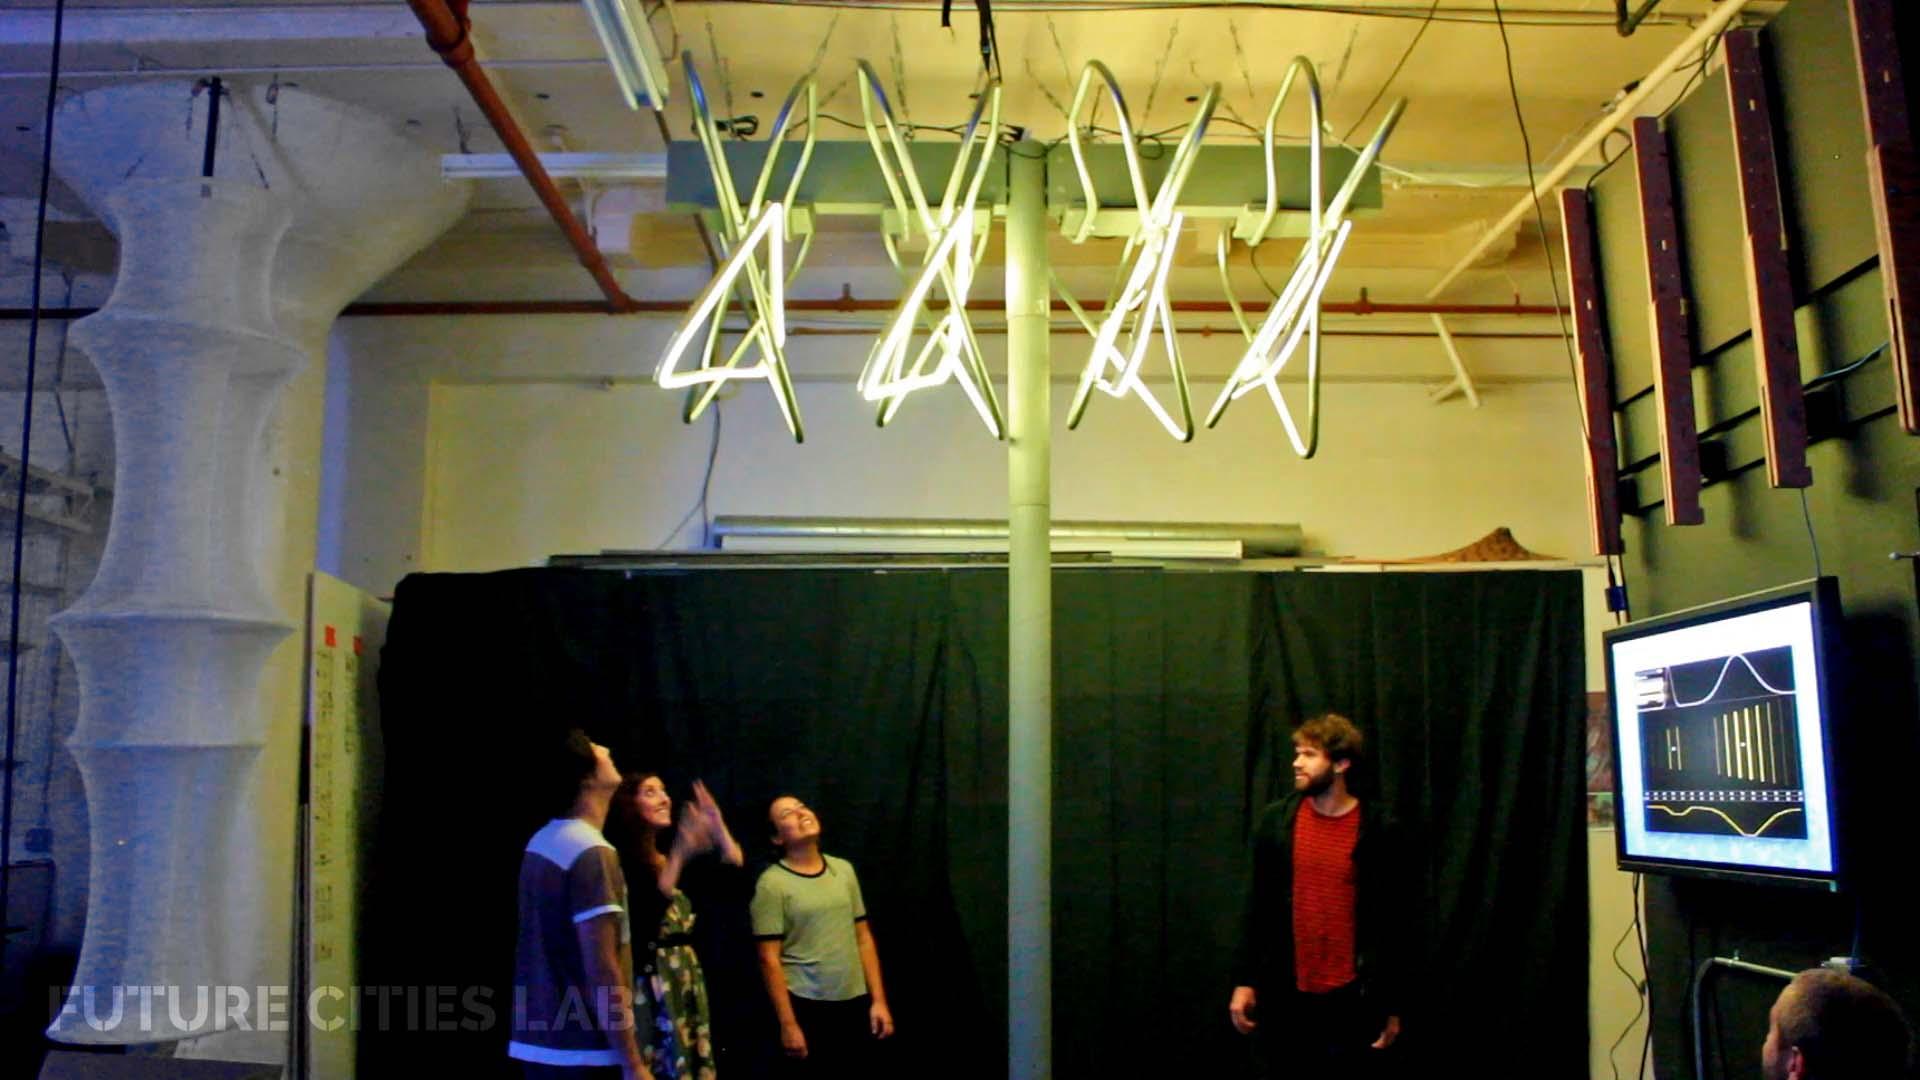 Lightweave Prototype Interaction with People